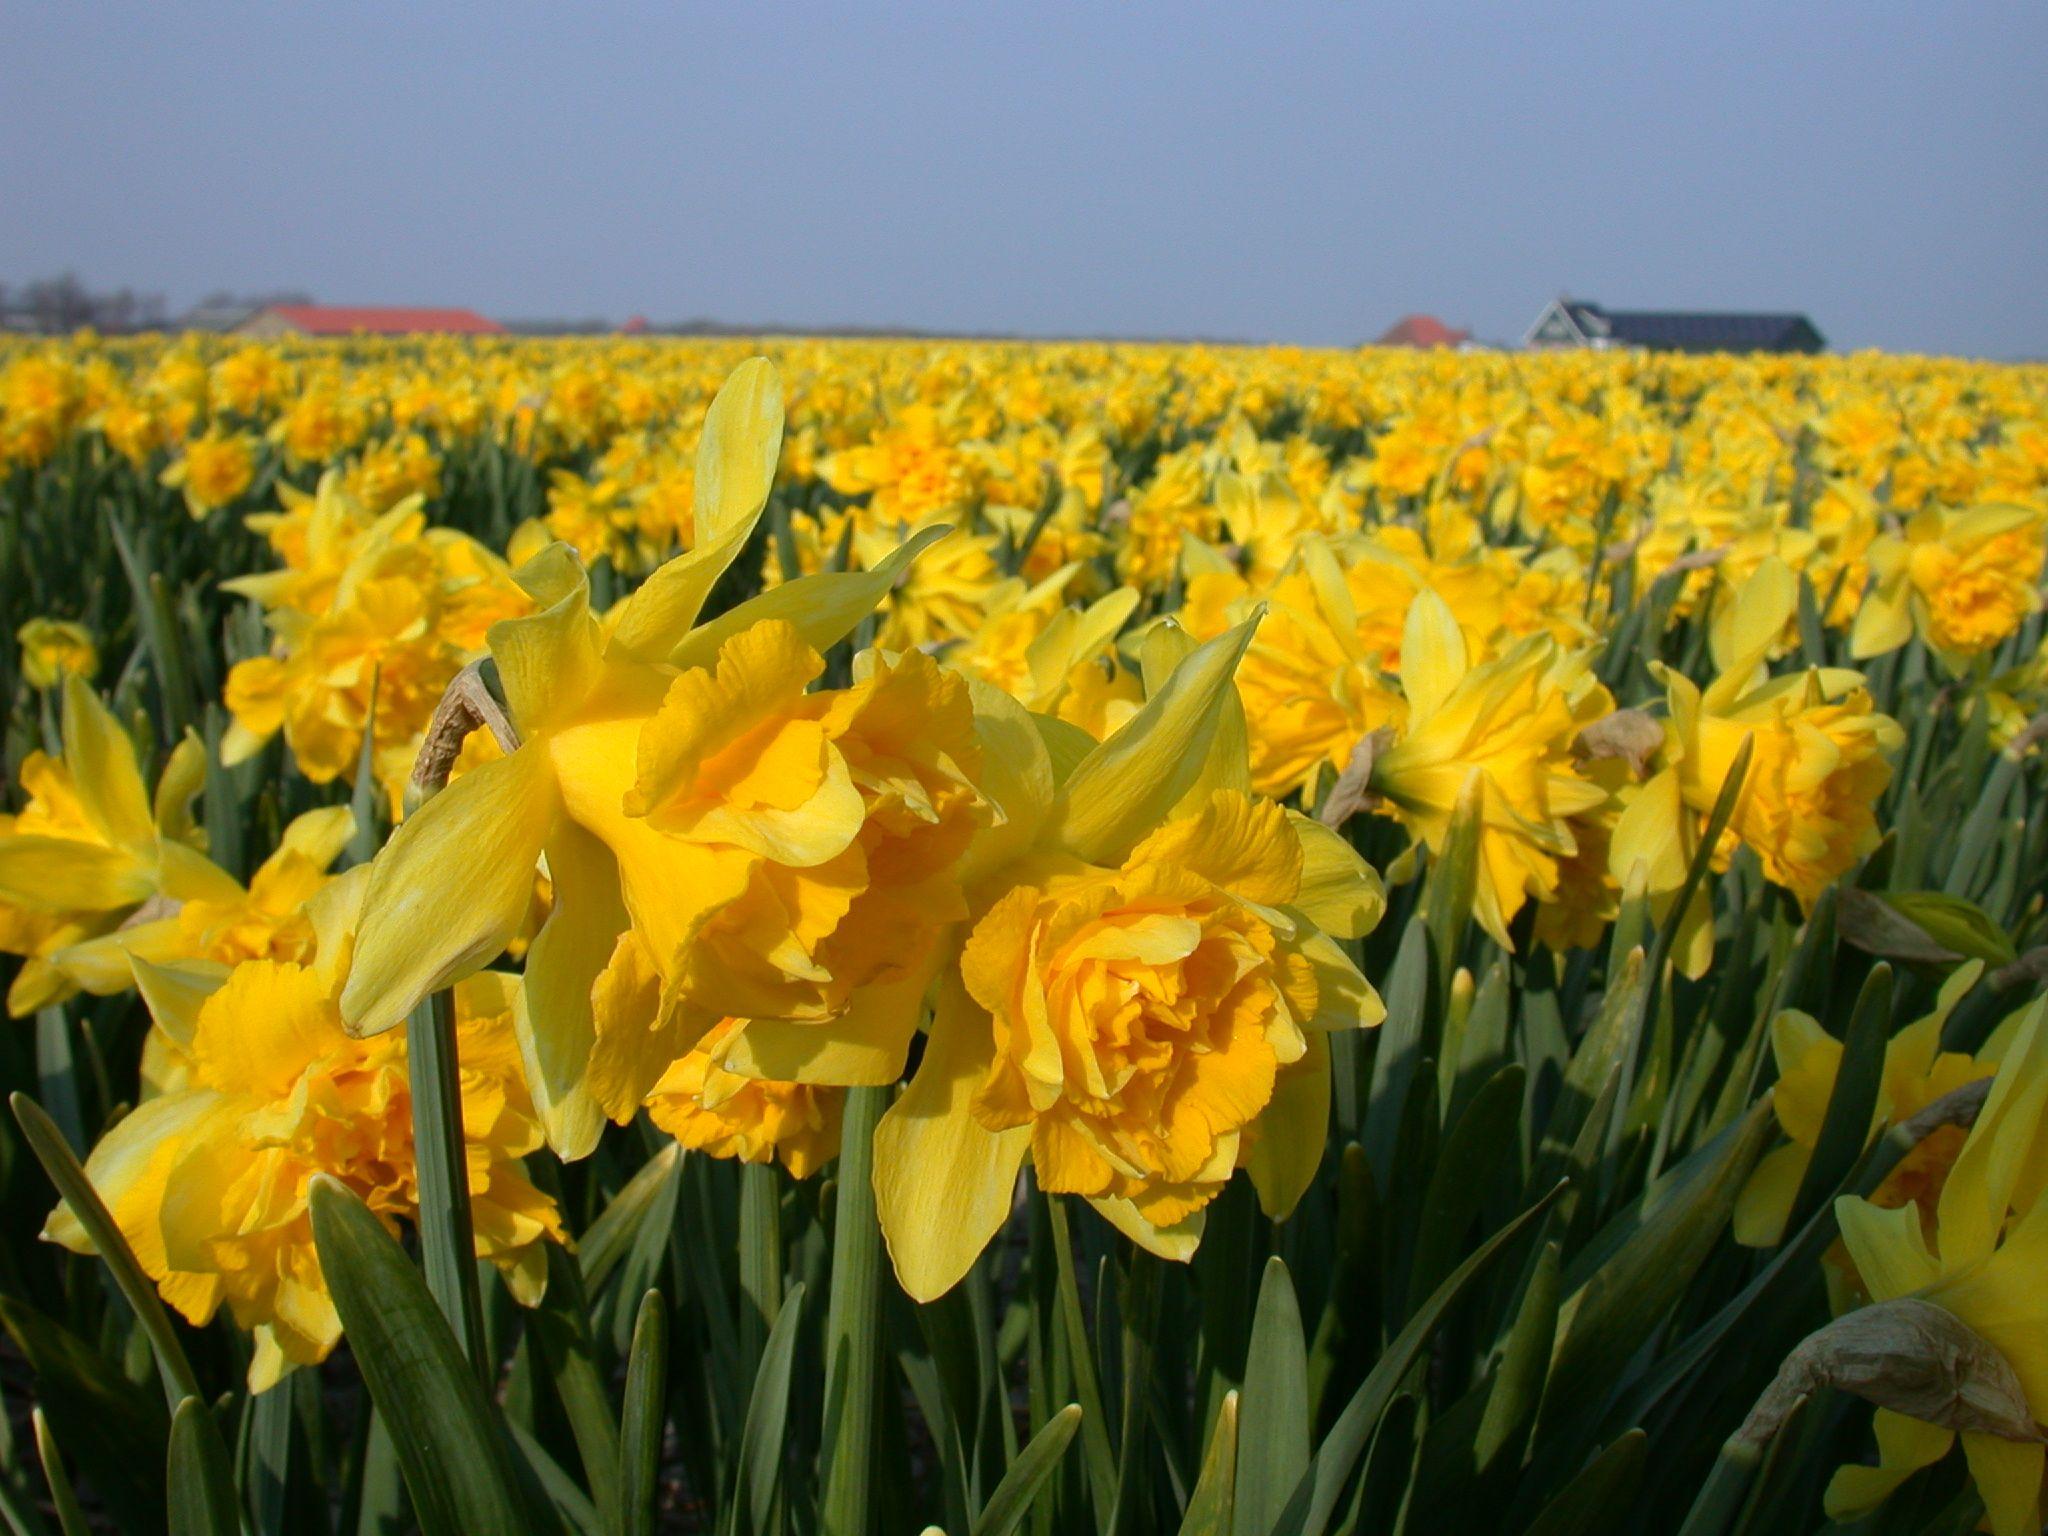 Daffodil Field Nature Plants Daffodils Daffodil Flower